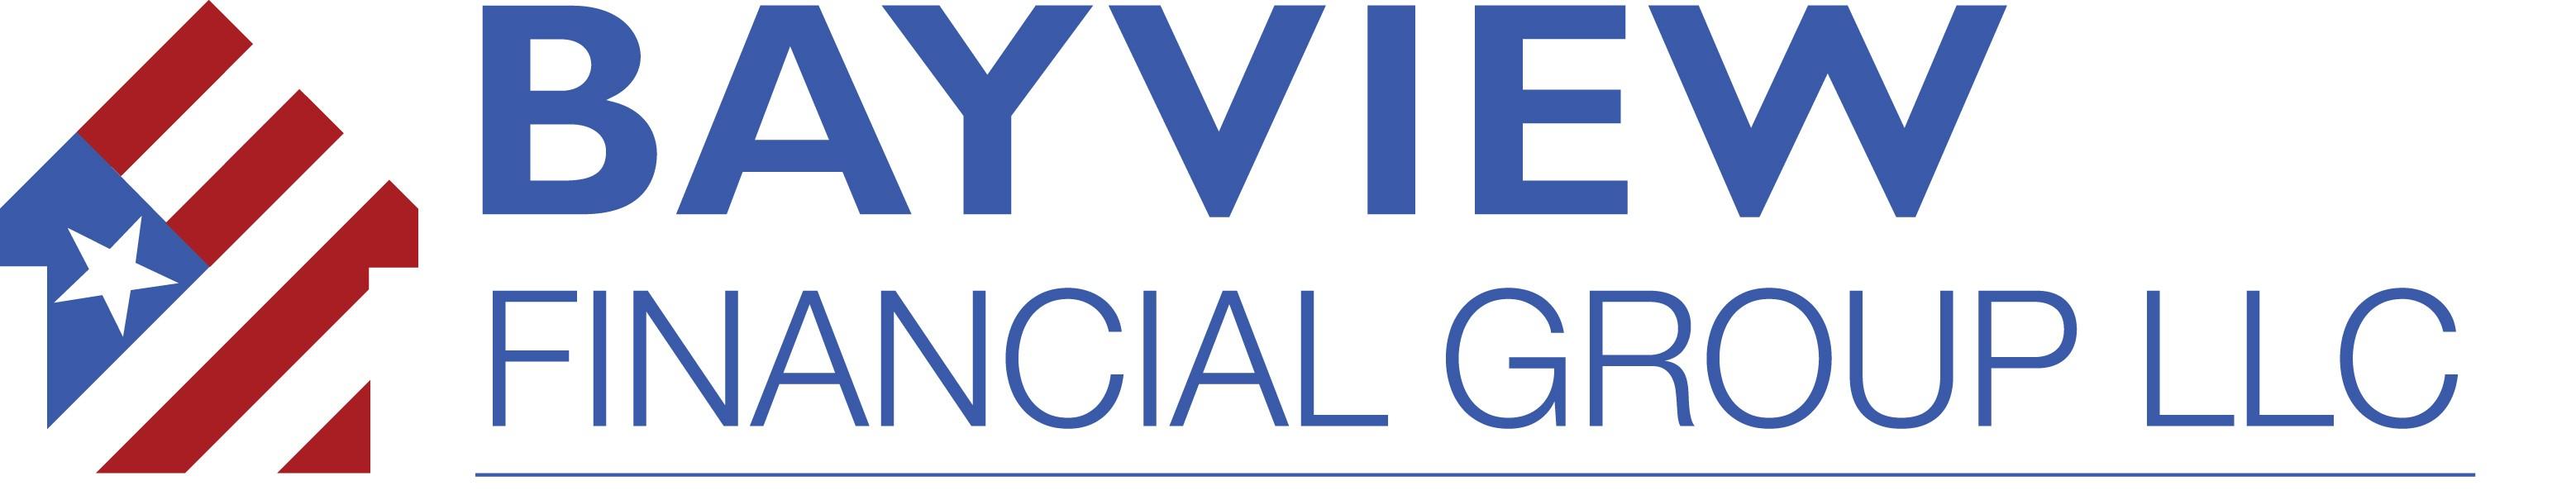 Bayview Financial Group, LLC